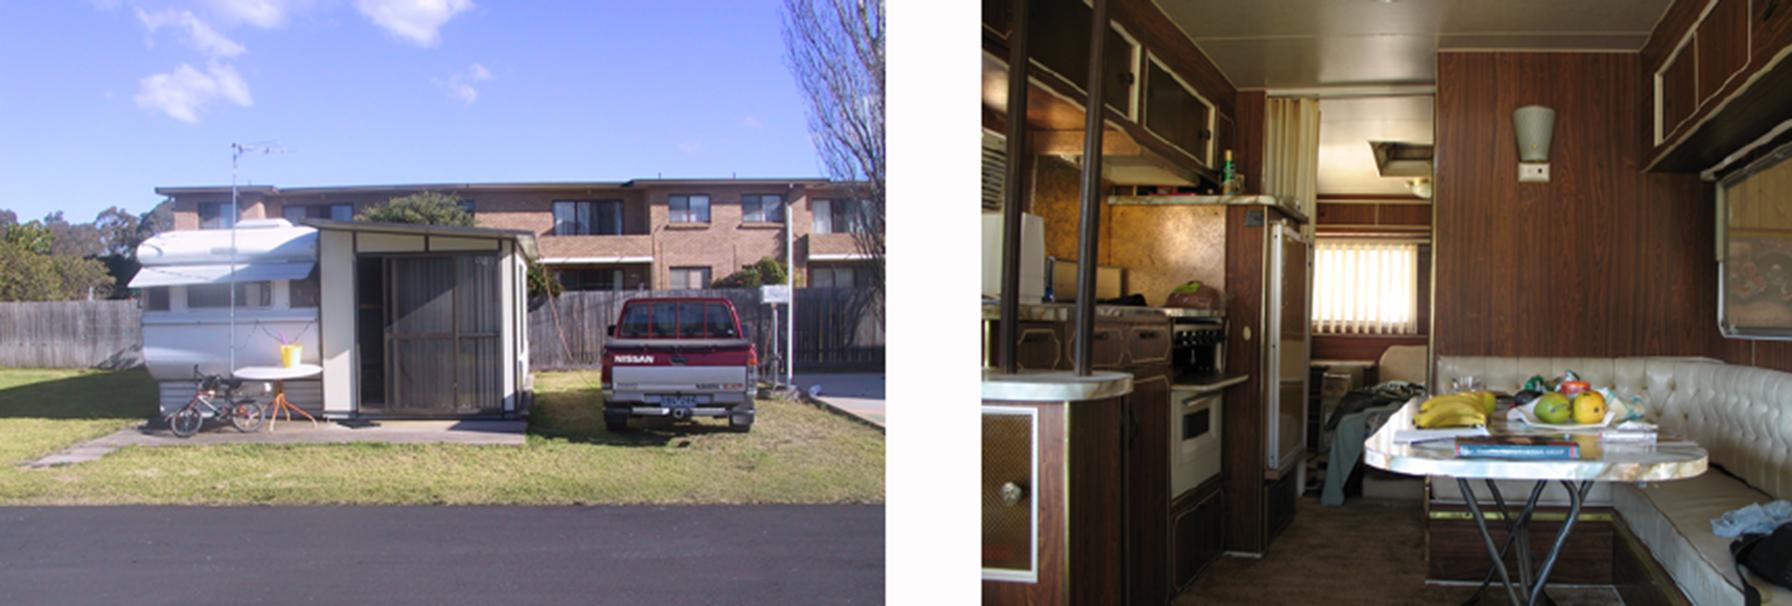 Val's Caravan, Narooma, NSW.